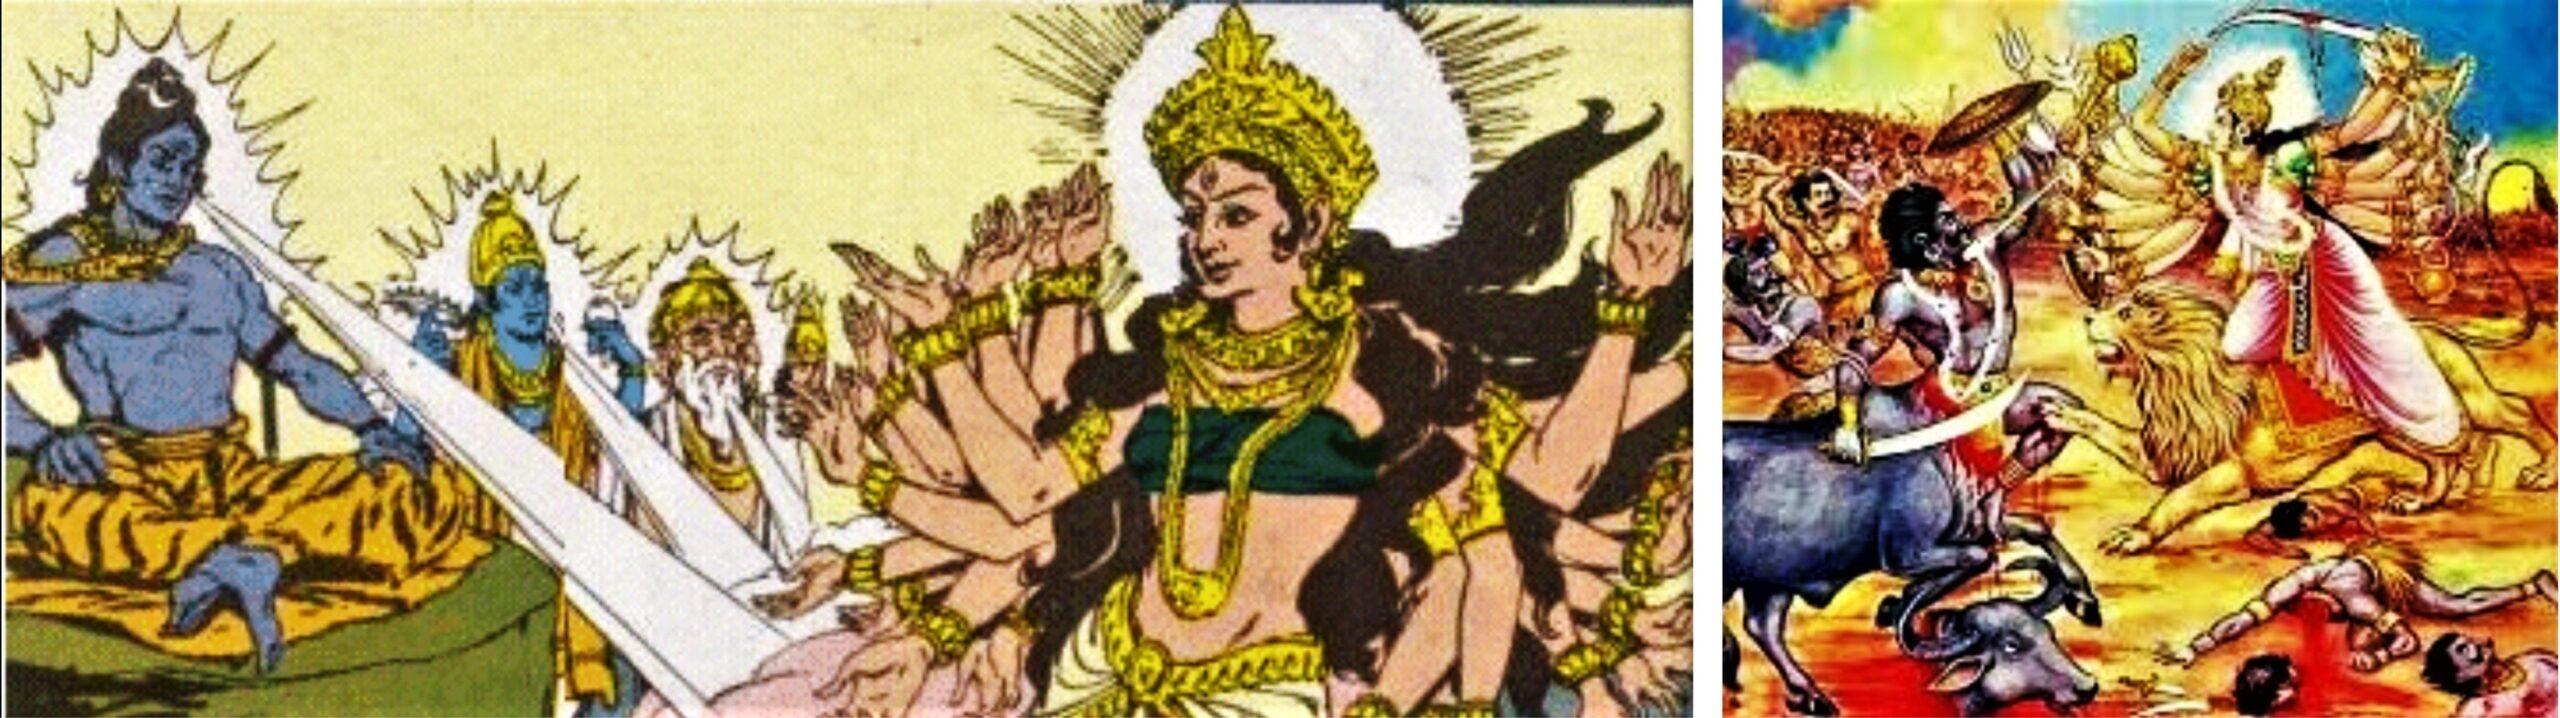 Left: Emergence of Goddess Durga, Right: Goddess Durga in a fierce battle with Mahishasura | PC - ritsin.com